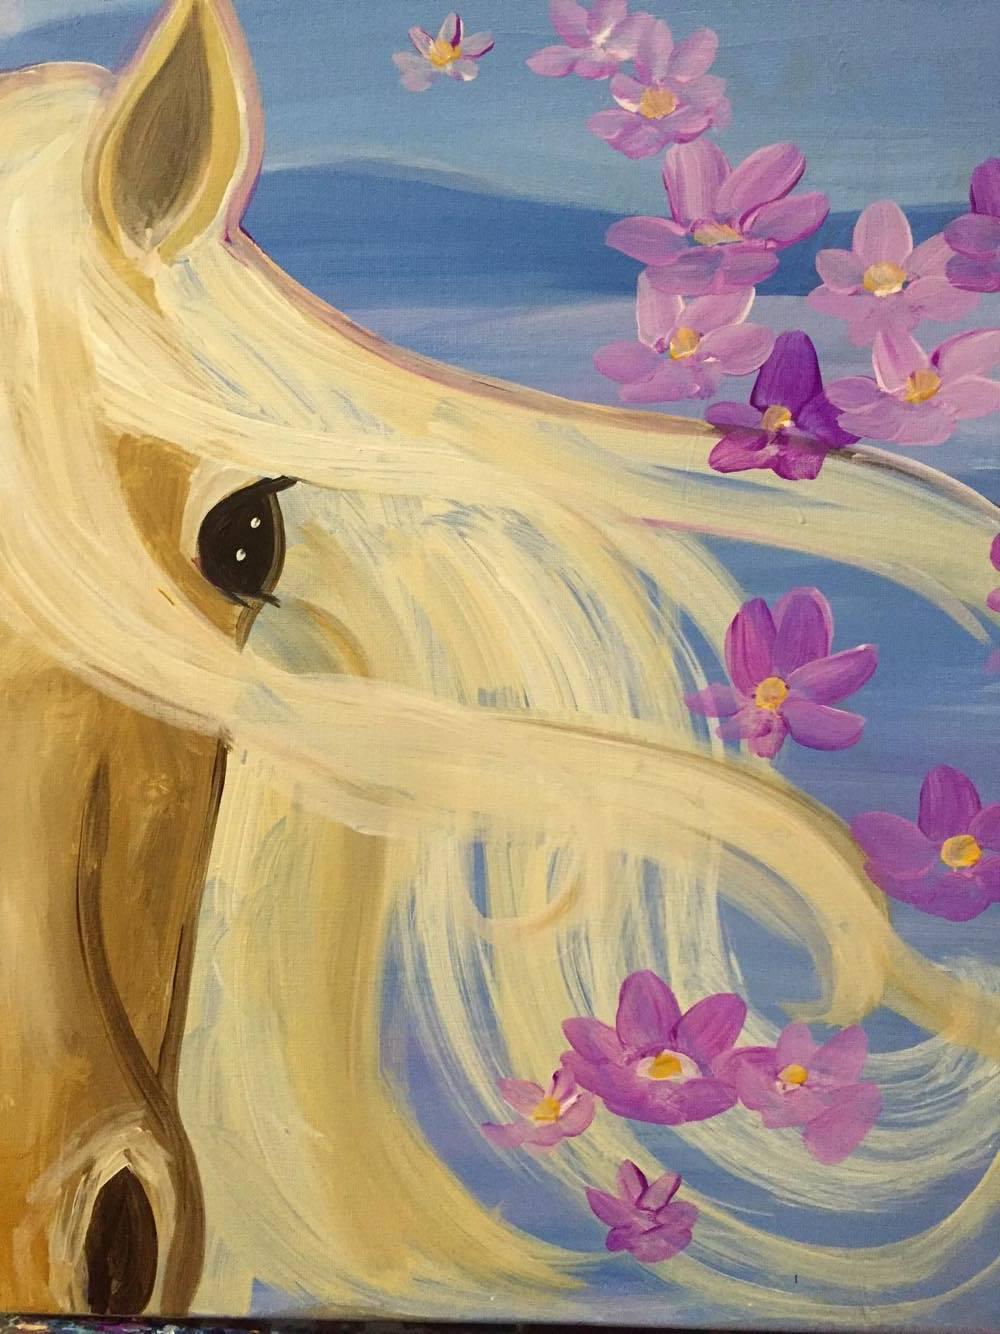 #19 Horse iin Pastels